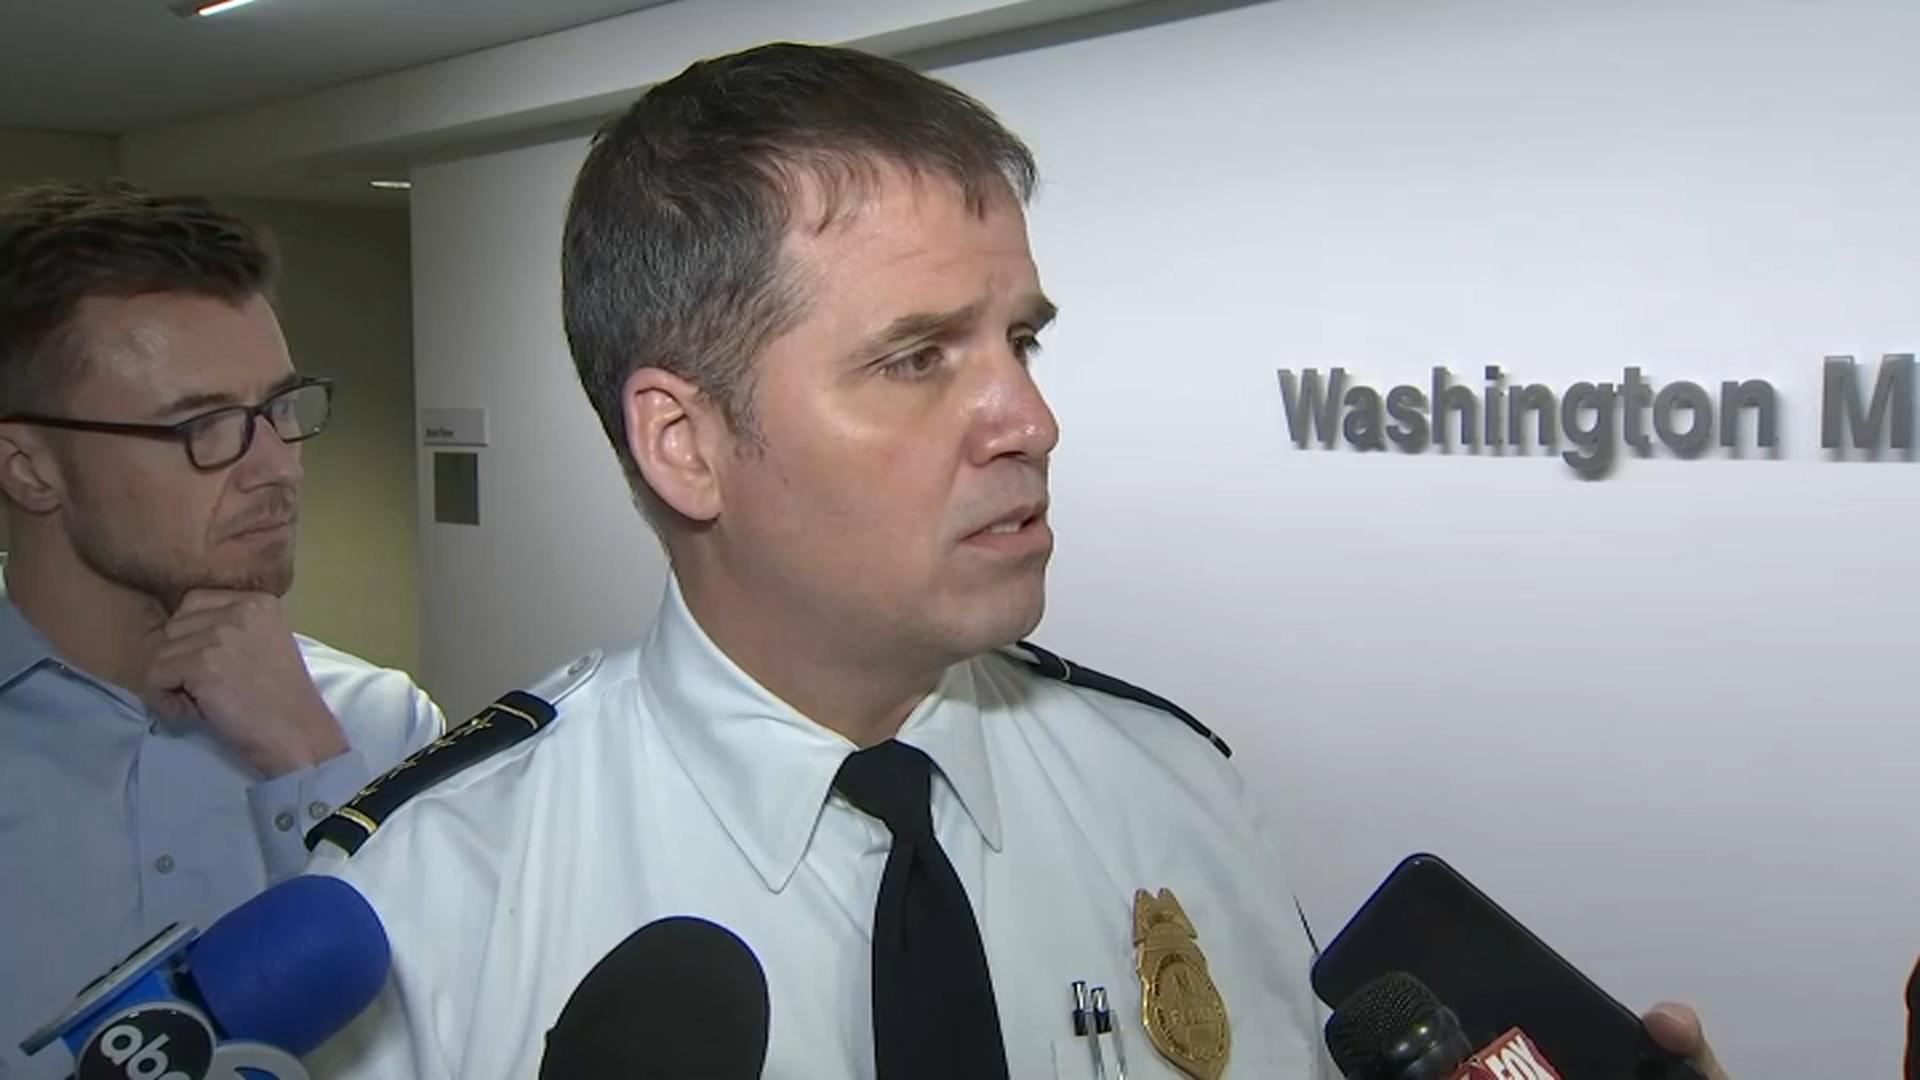 Metro Transit Police Address Ticket-Writing Contest